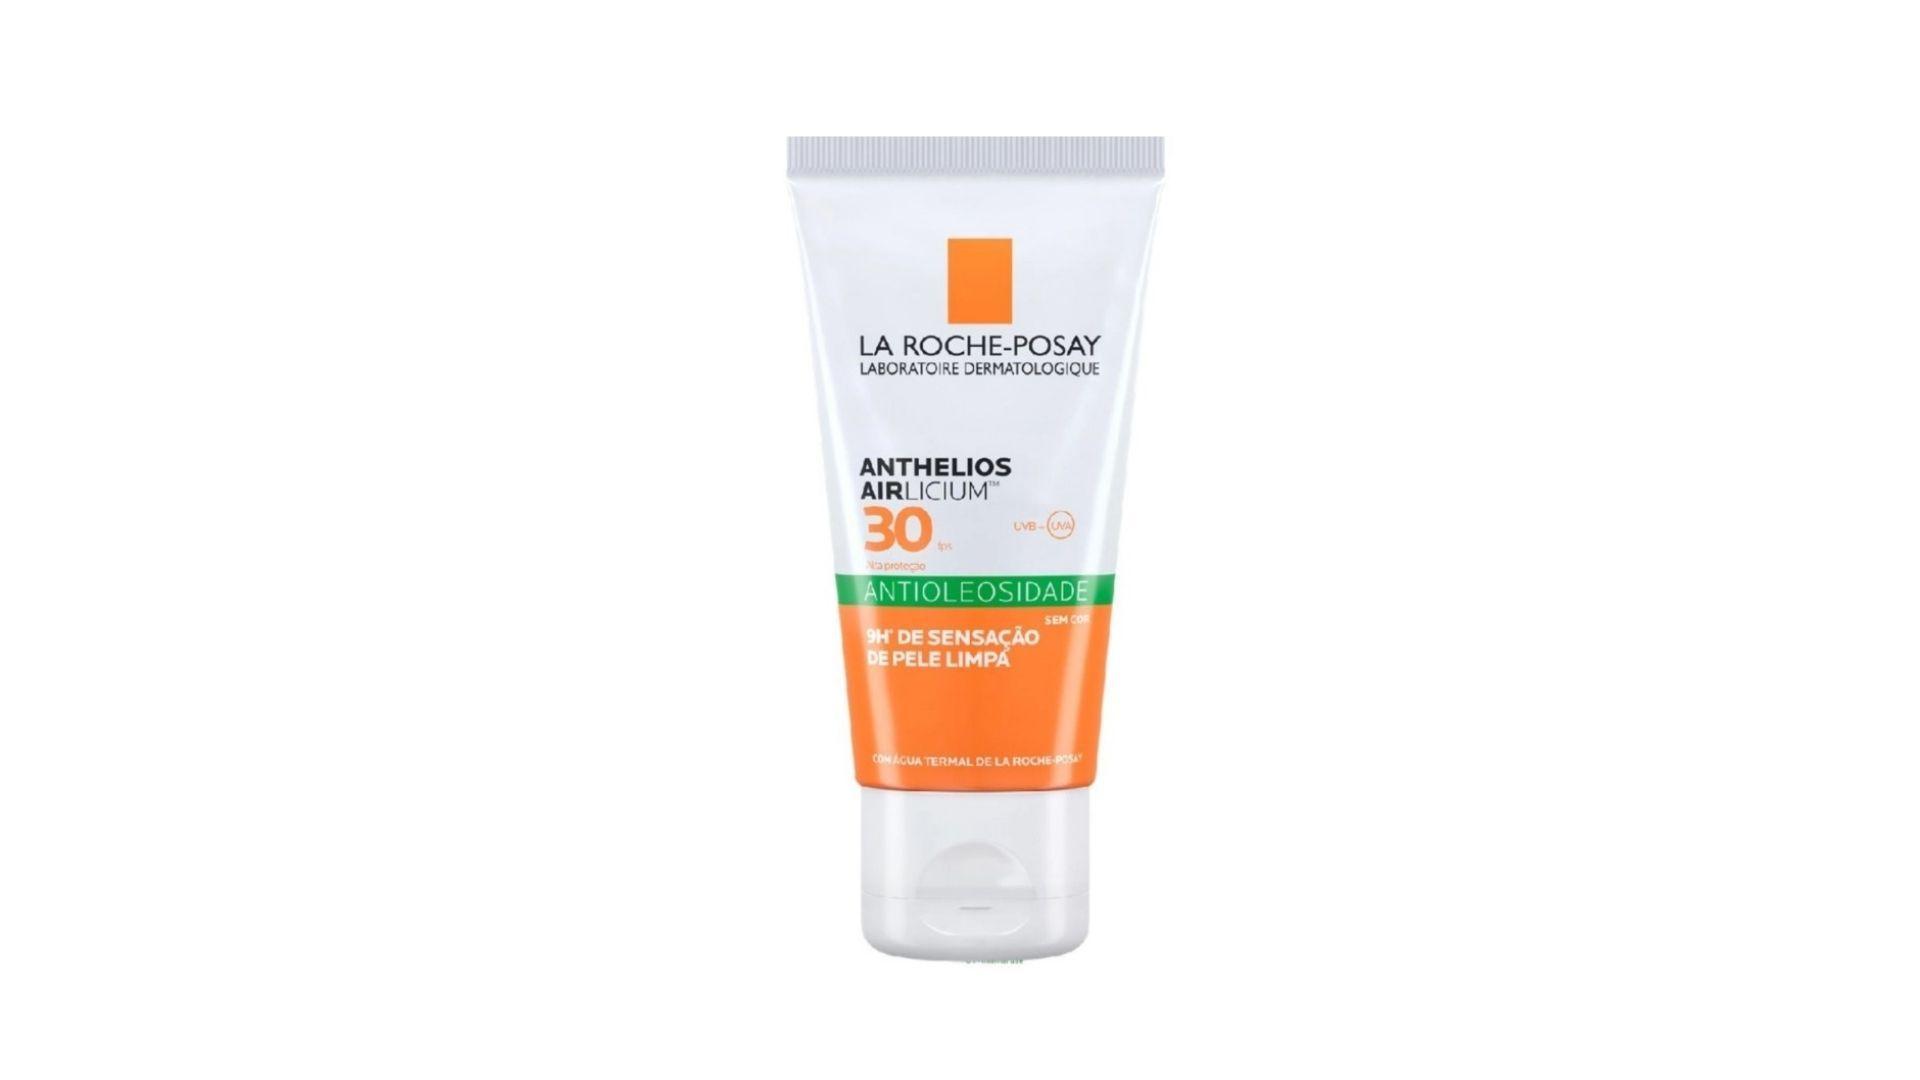 Nada de esquecer a proteção solar! A dermatologista indica o Anthelios Airlicium de La Roche-Posay (Foto: Reprodução, La Roche-Posay)